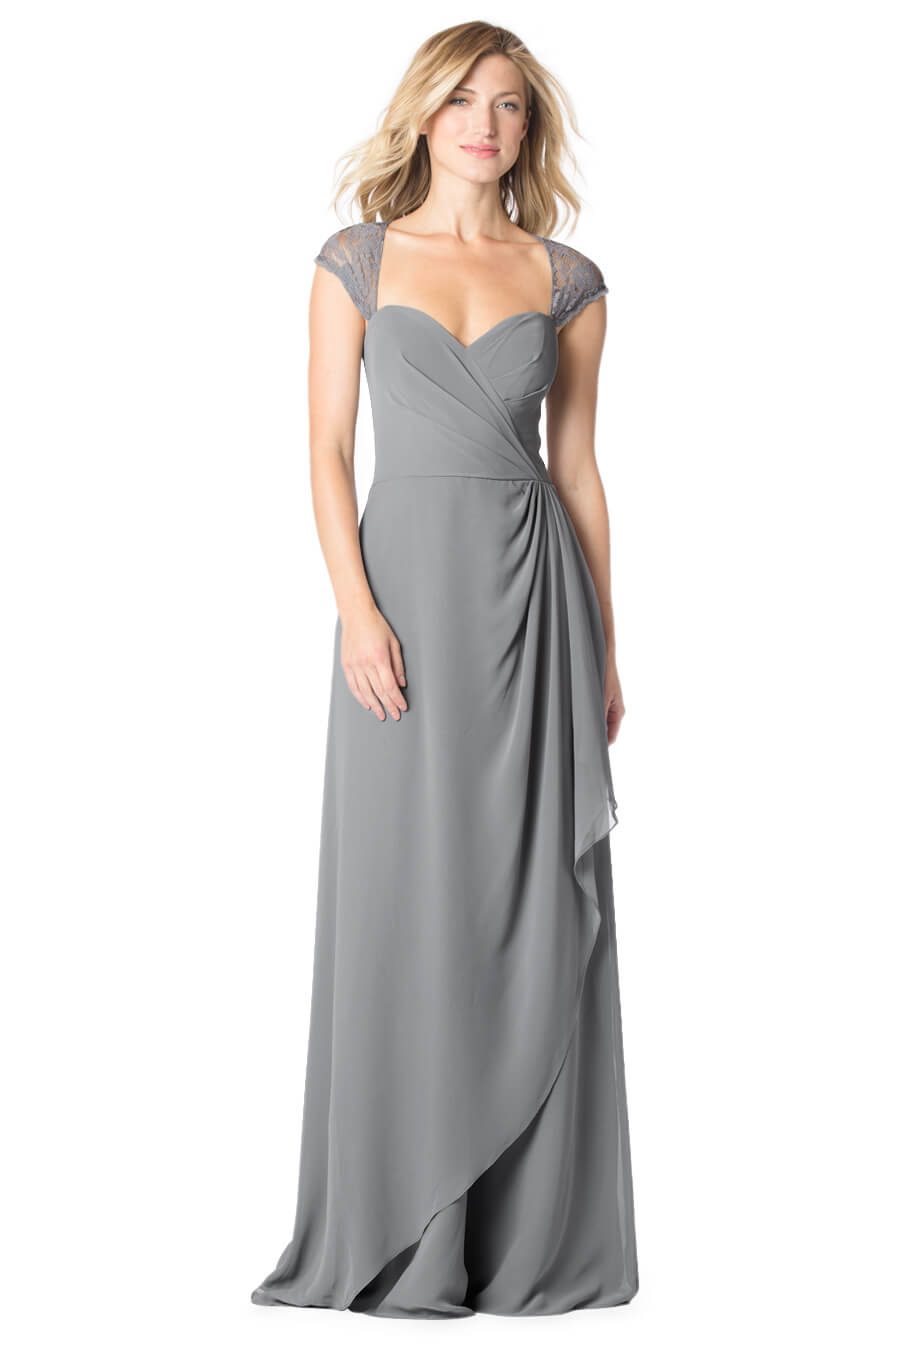 Bari jay bridesmaids bridesmaid dresses prom dresses formal bari jay bridesmaids bridesmaid dresses prom dresses formal gowns bari jay and shimmer ombrellifo Images